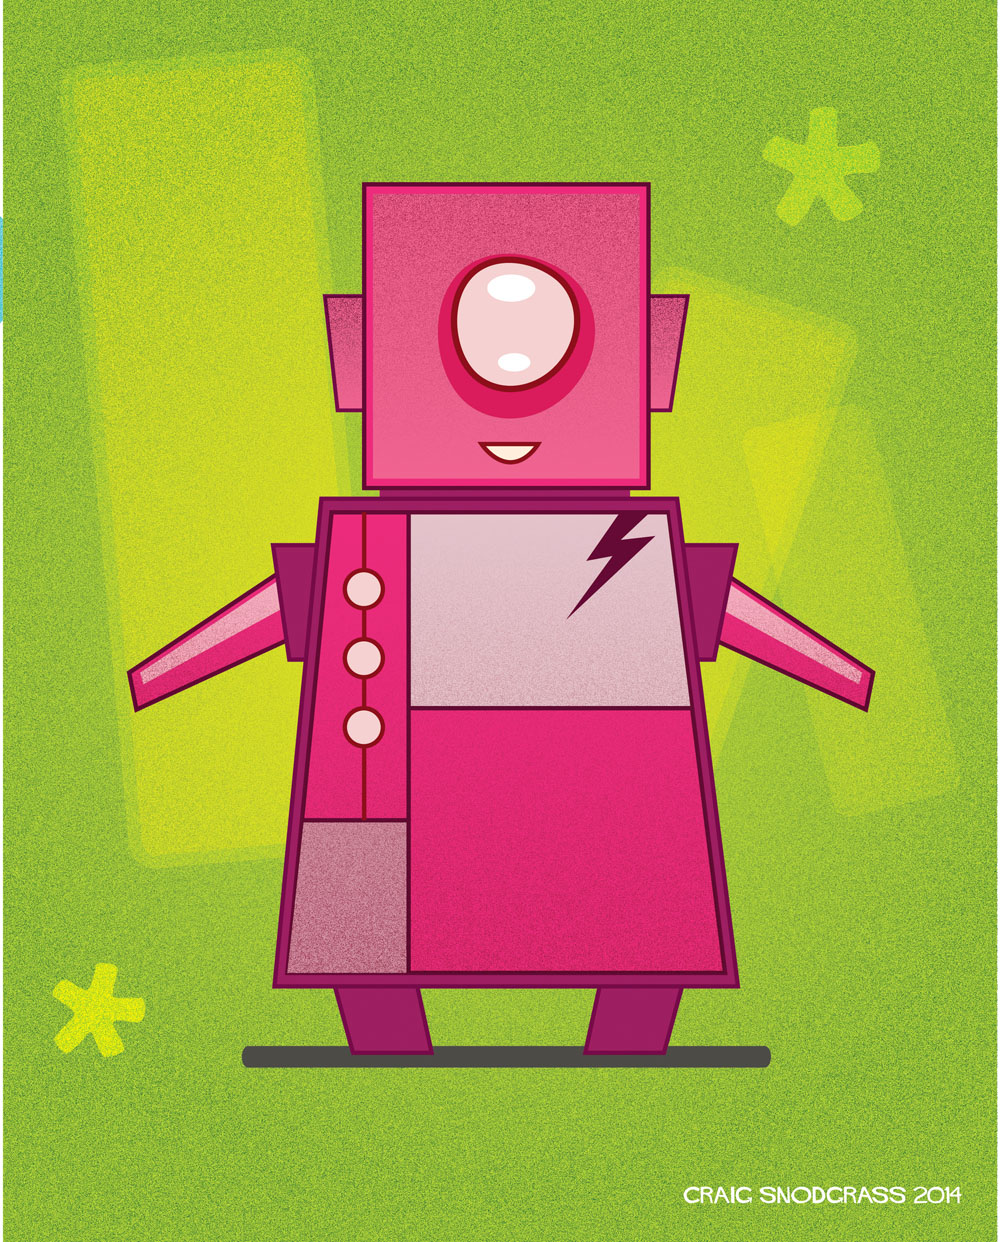 pink-bot-vector-8x10.jpg